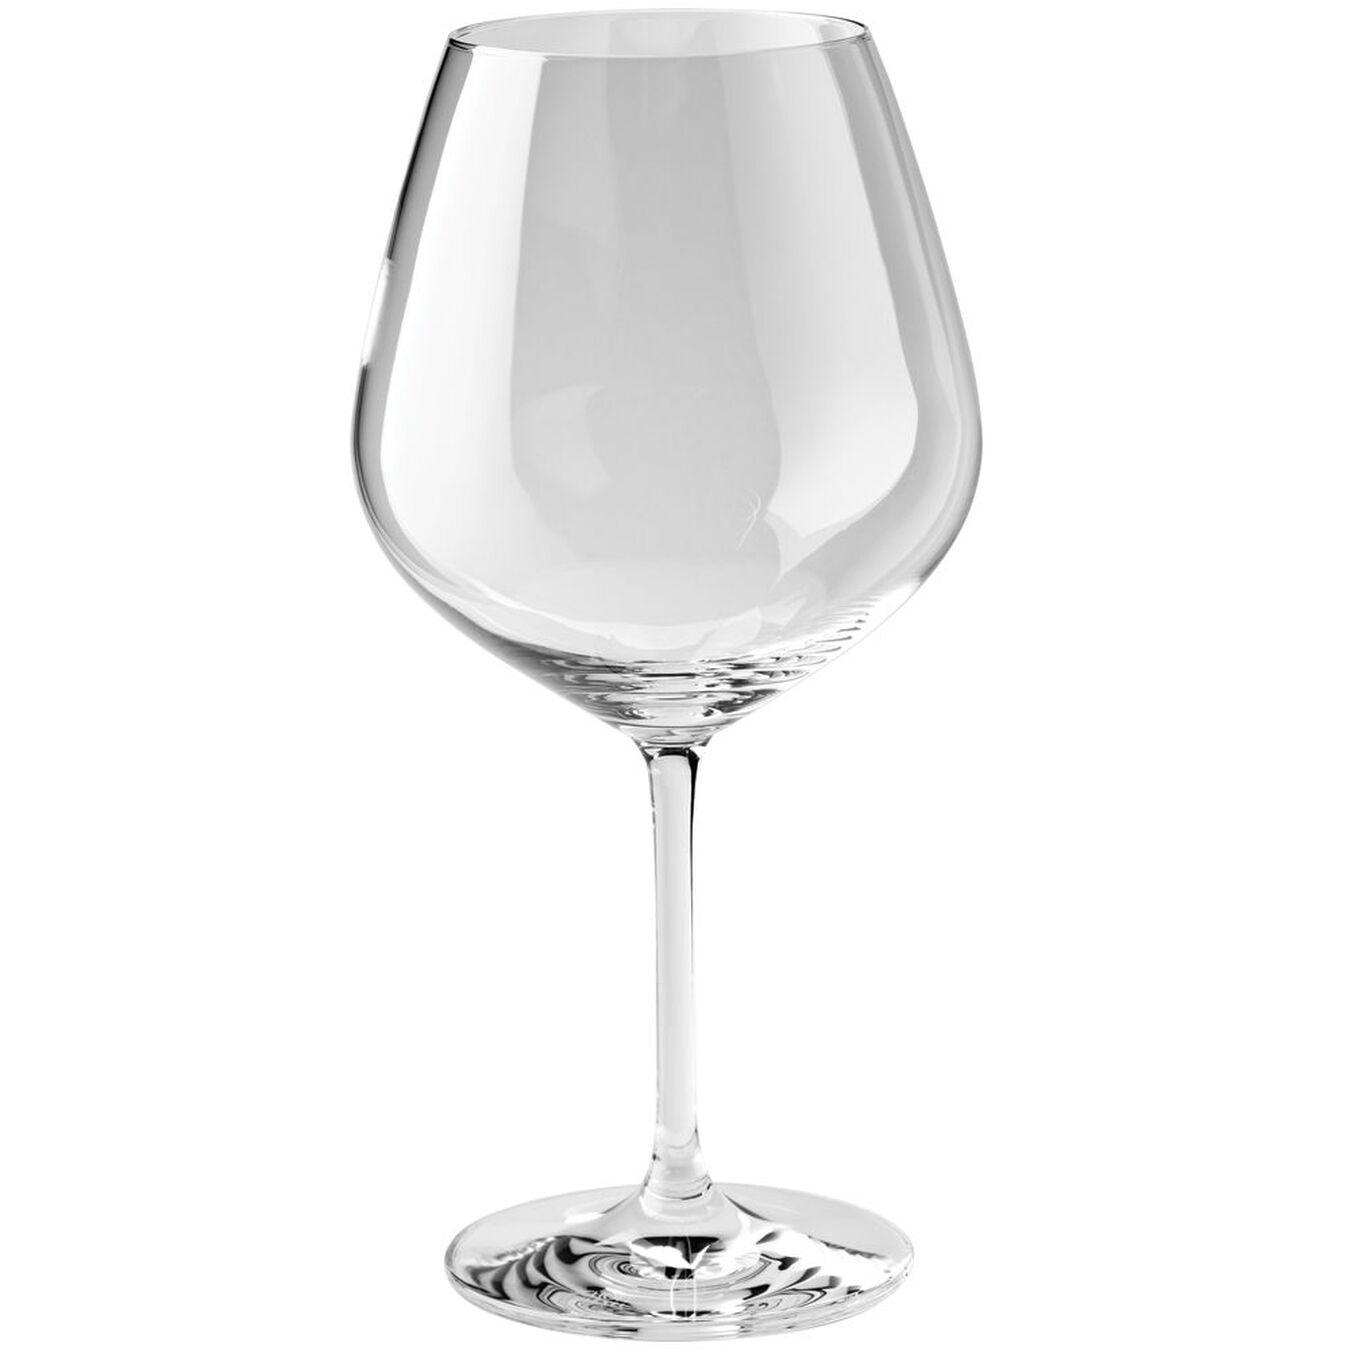 6-pc Burgundy Grand Glass Set,,large 1